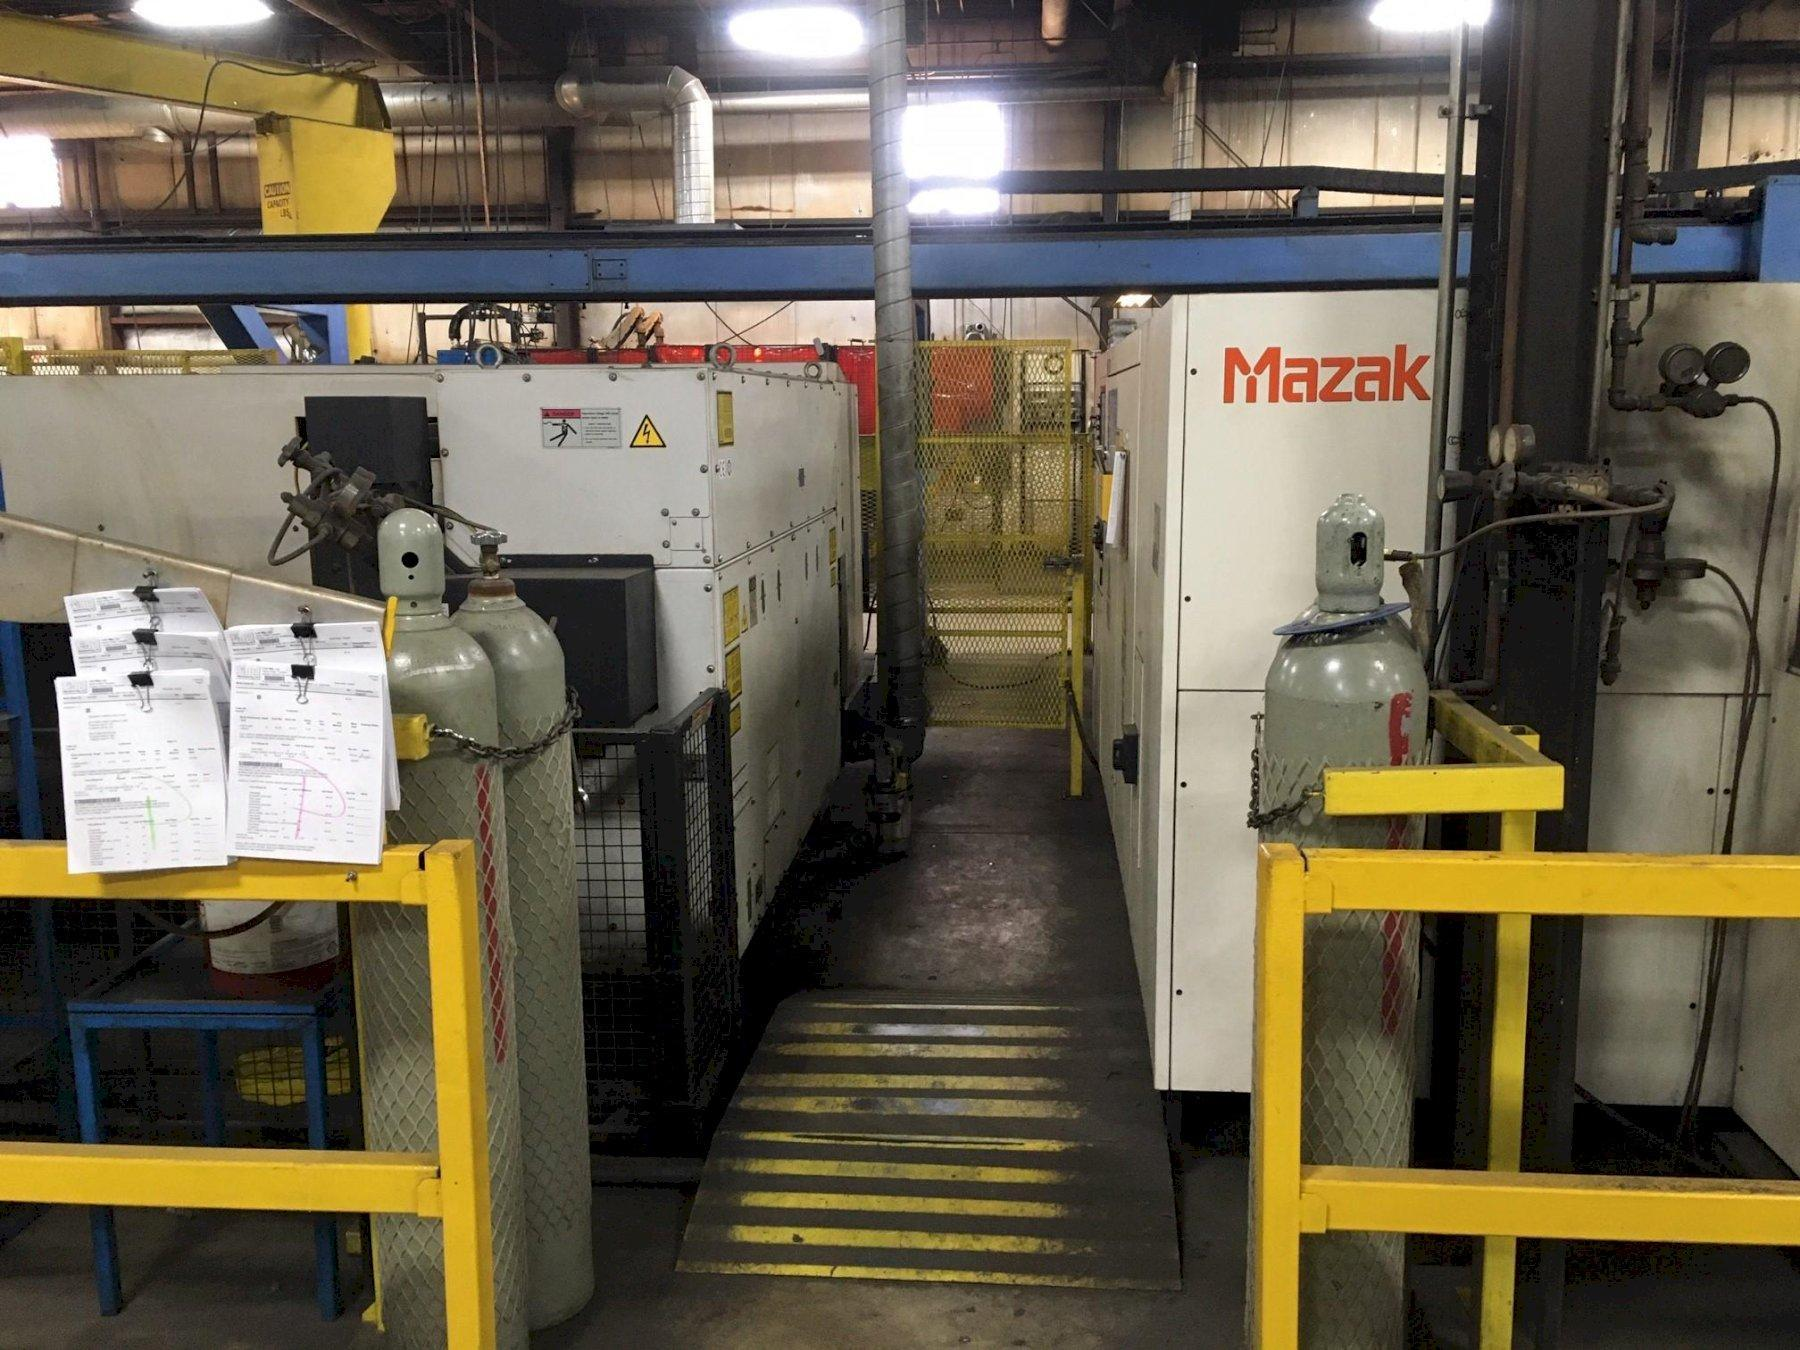 2012 Mazak STX510 Mark-III, 5x10, 4000 Watt Co2 CNC Laser